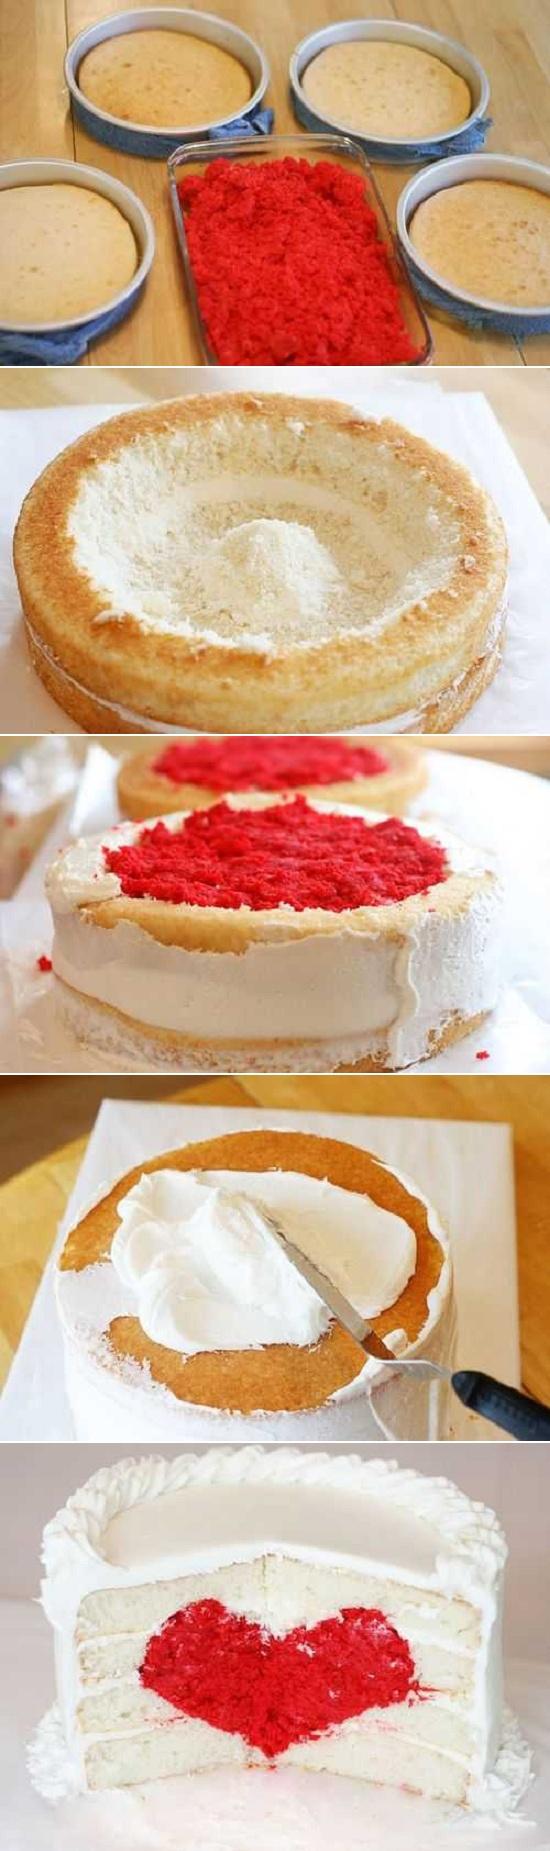 Red velvet suprise love heart suprise cupcake